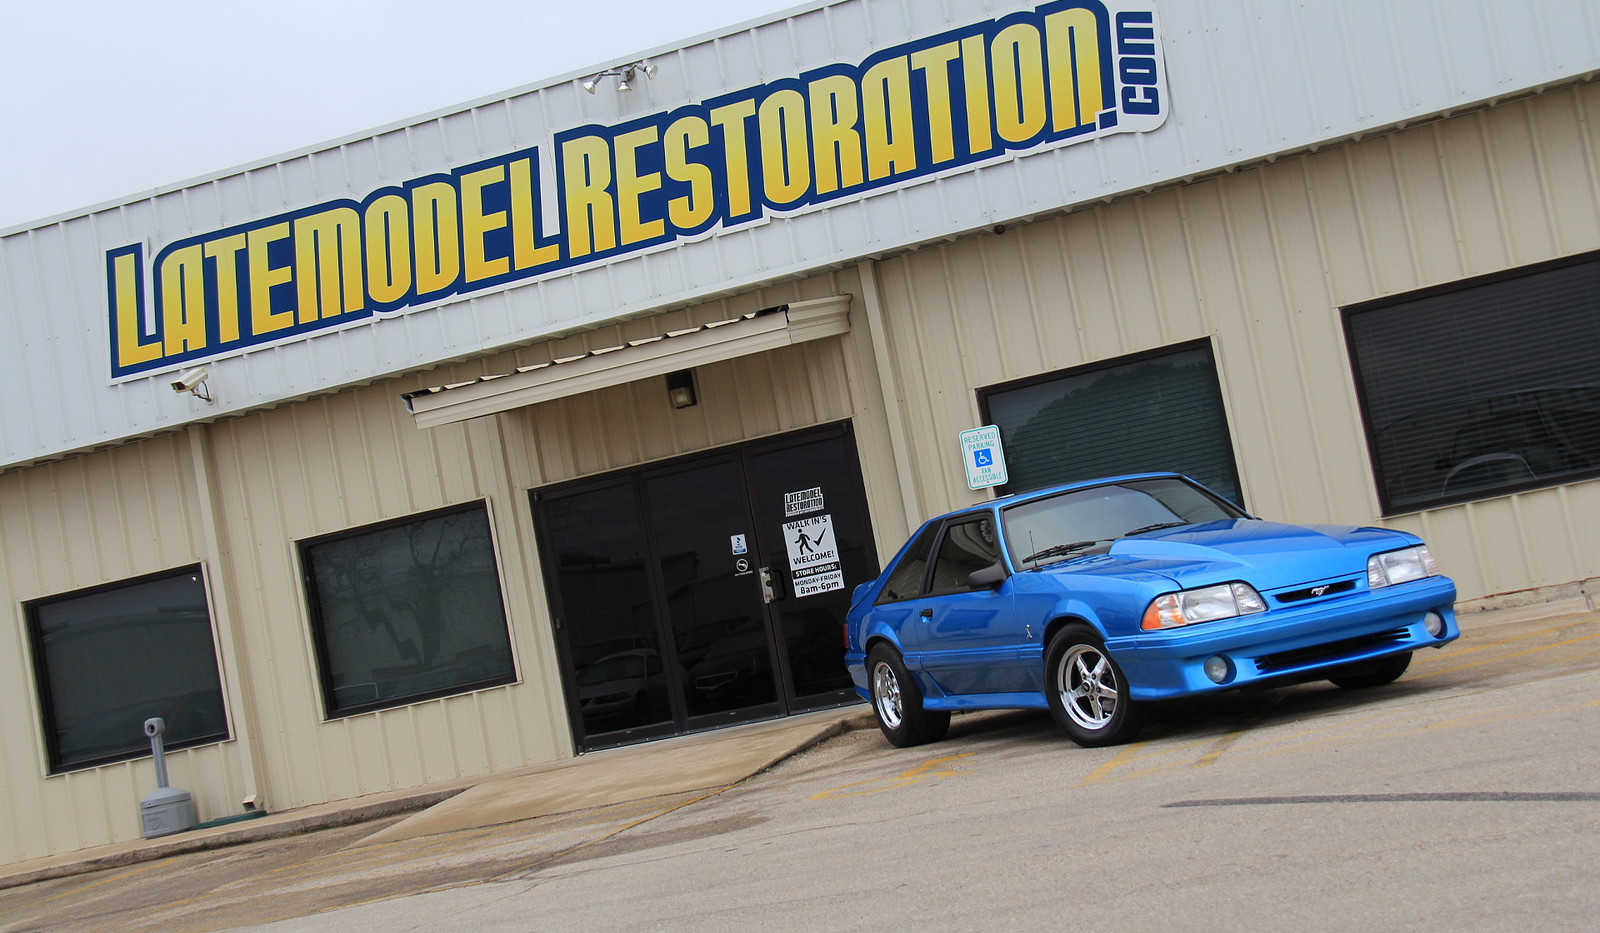 Latemodel_Restoration_Fox_Body_Mustang.j